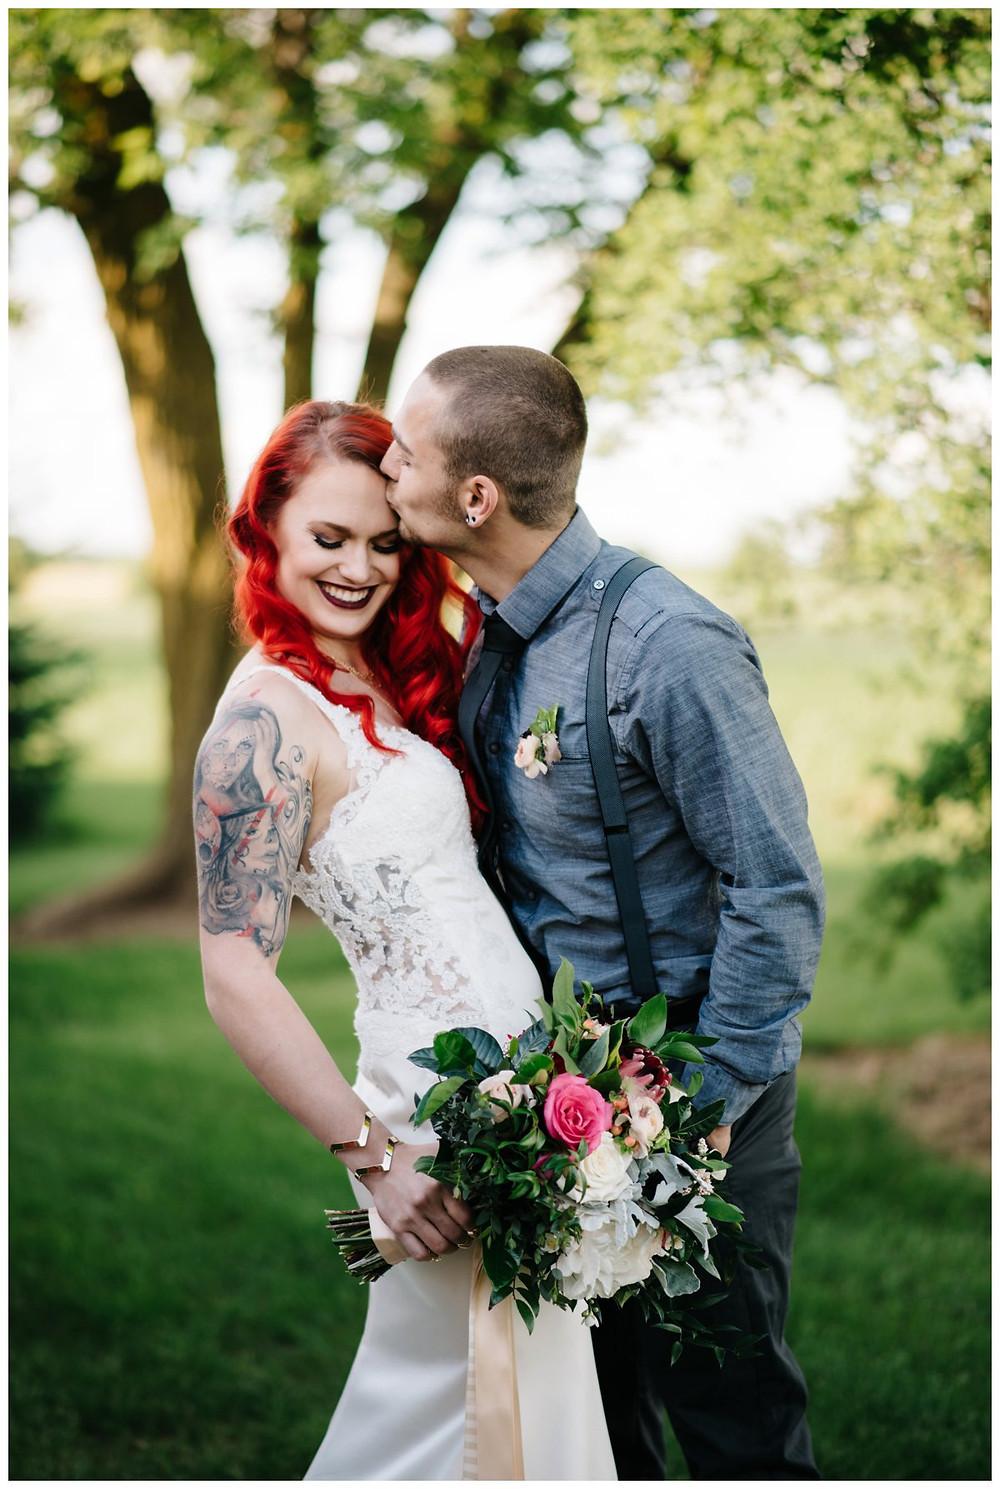 groom-kissing-brides-forehead-at-homestead-meadows-styled-shoot-by-appleton-wedding-photographer-kyra-rane-photography